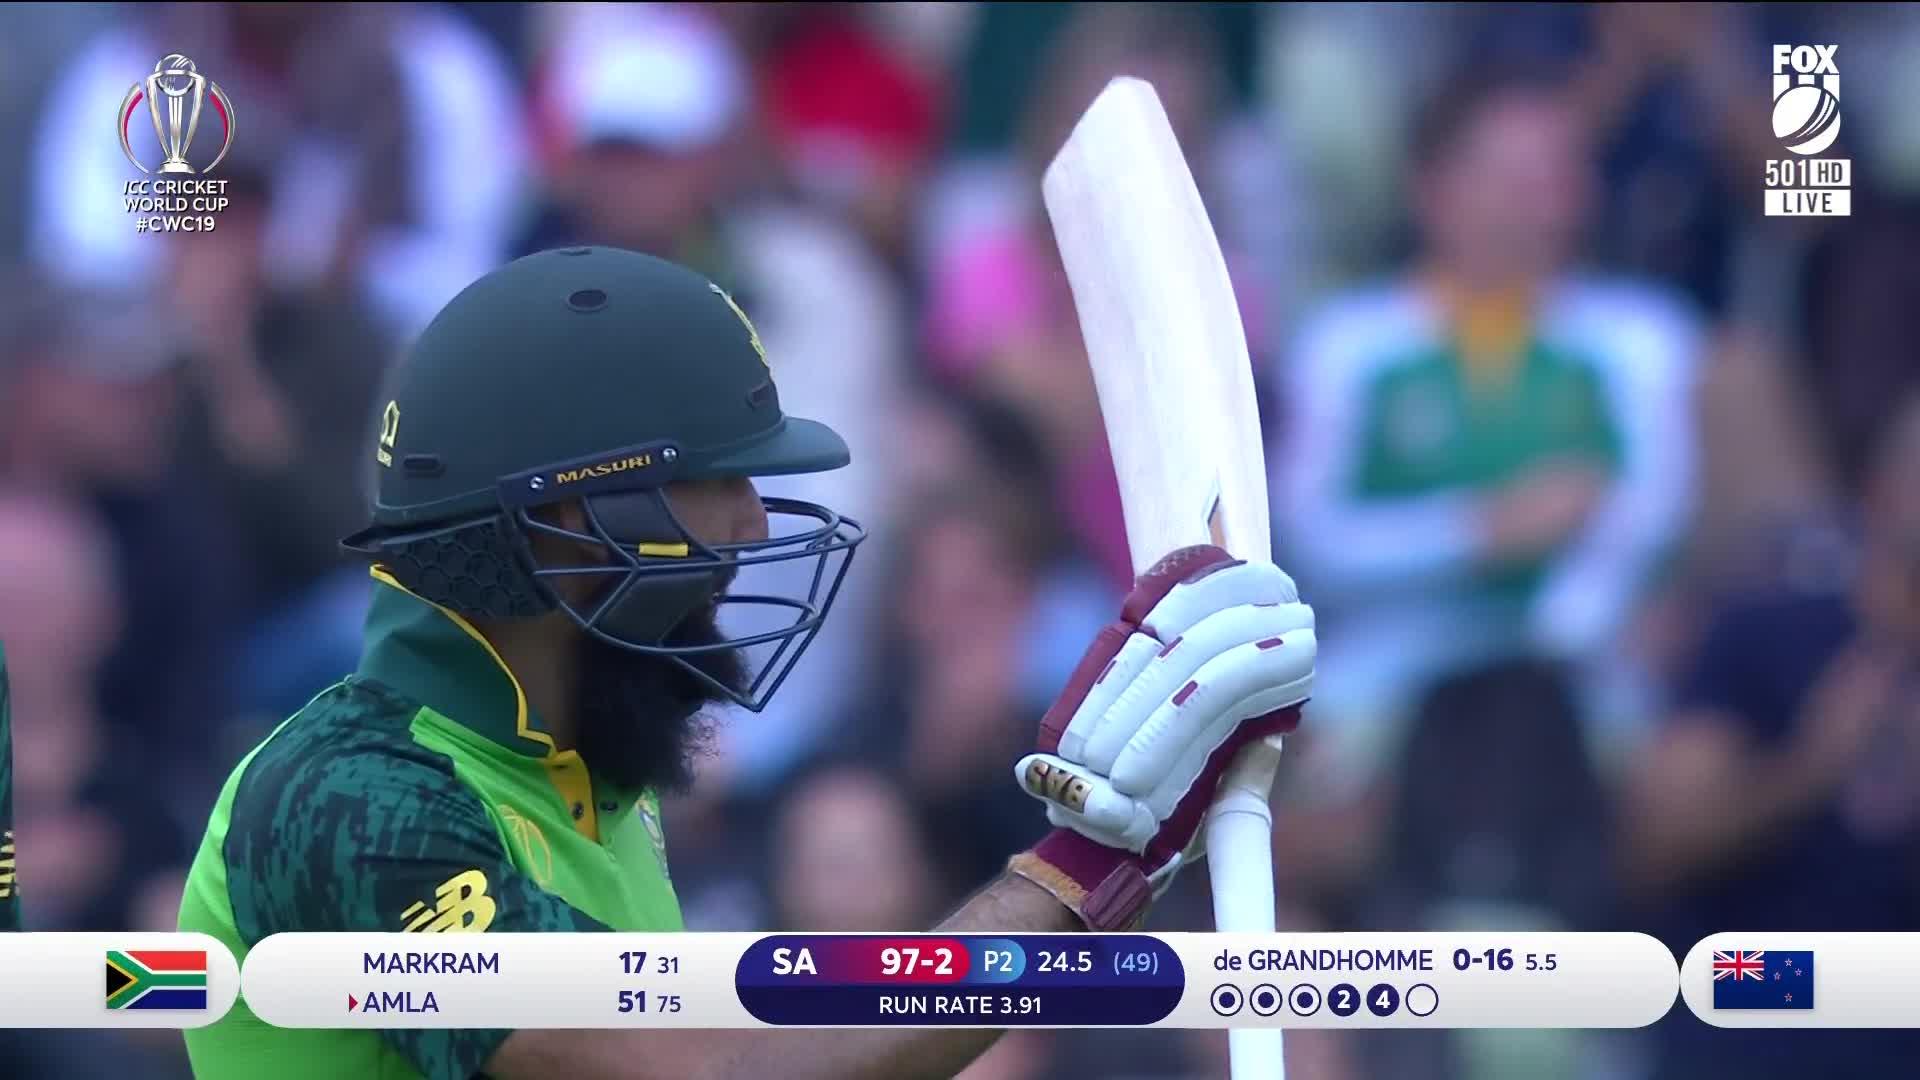 Fox Cricket / Twitter